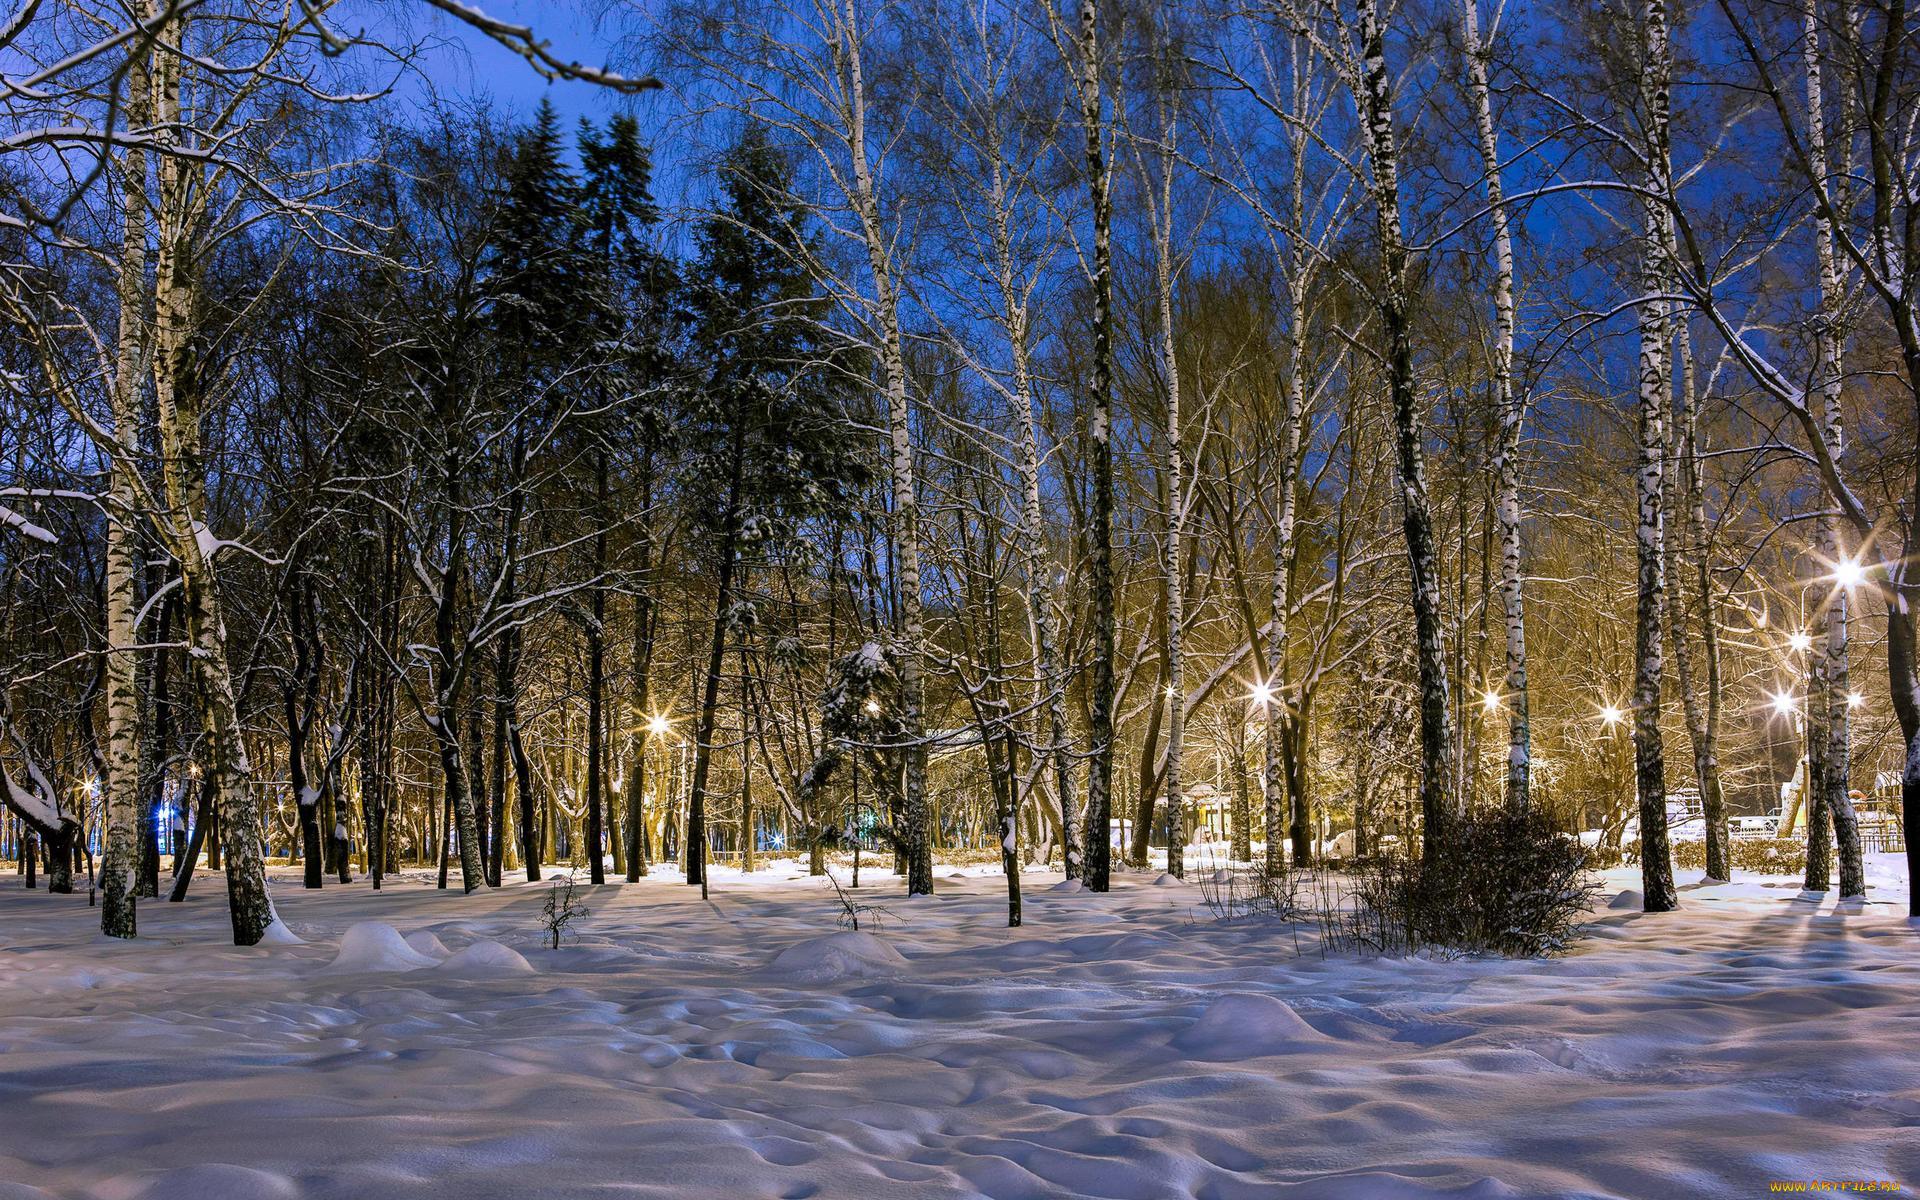 картинки зимнего парка элемент его важен